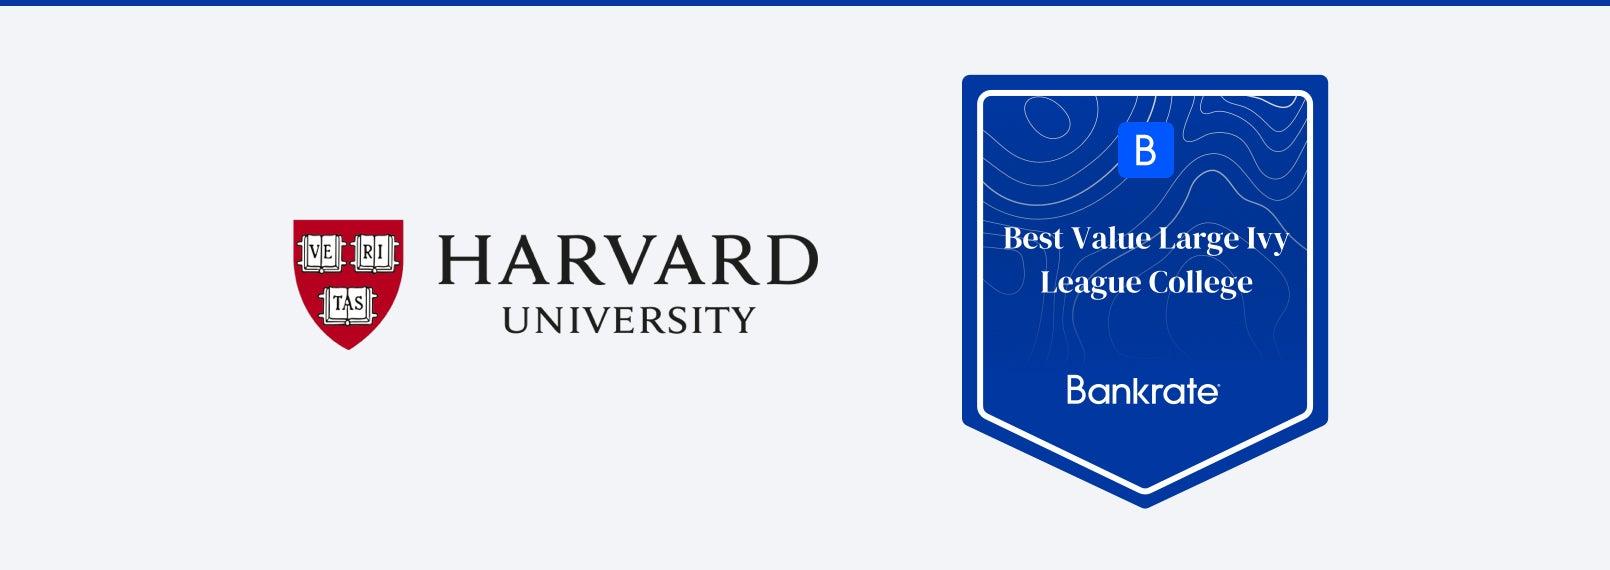 Harvard badge